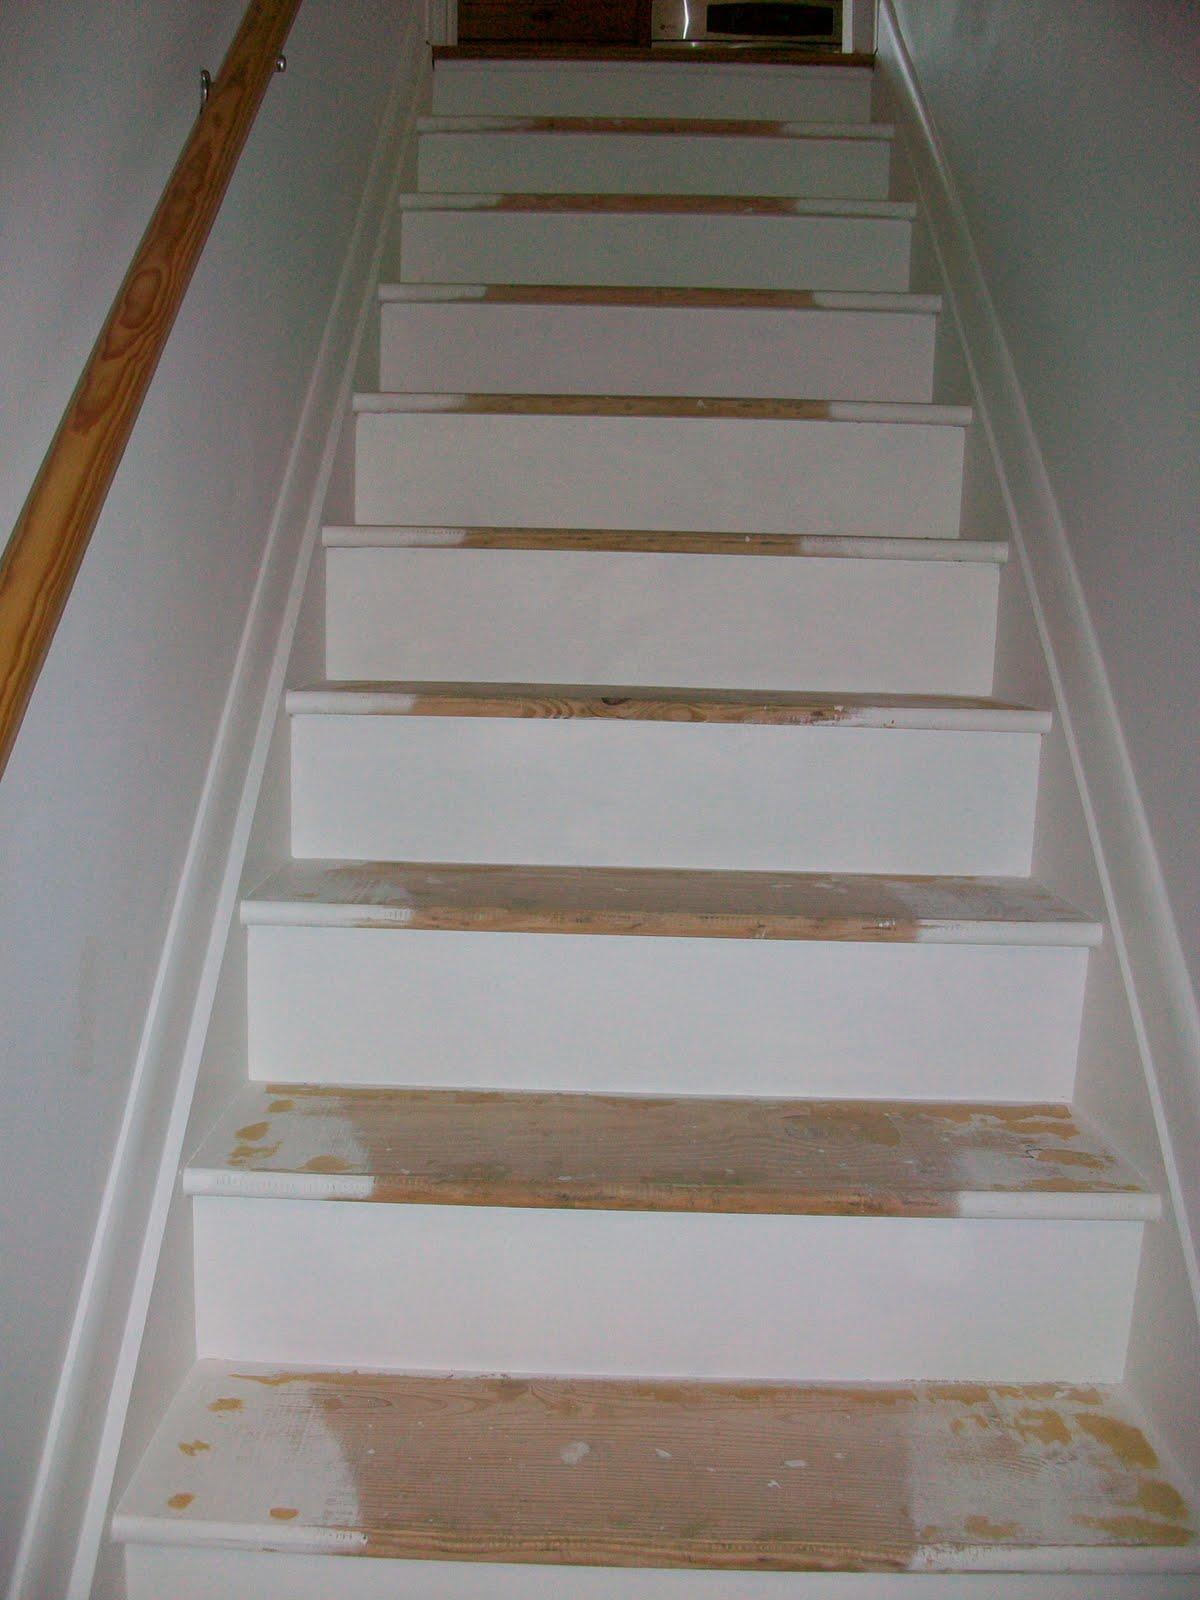 Lighting Basement Washroom Stairs: Pine Tree Home: Painted Stairs- One